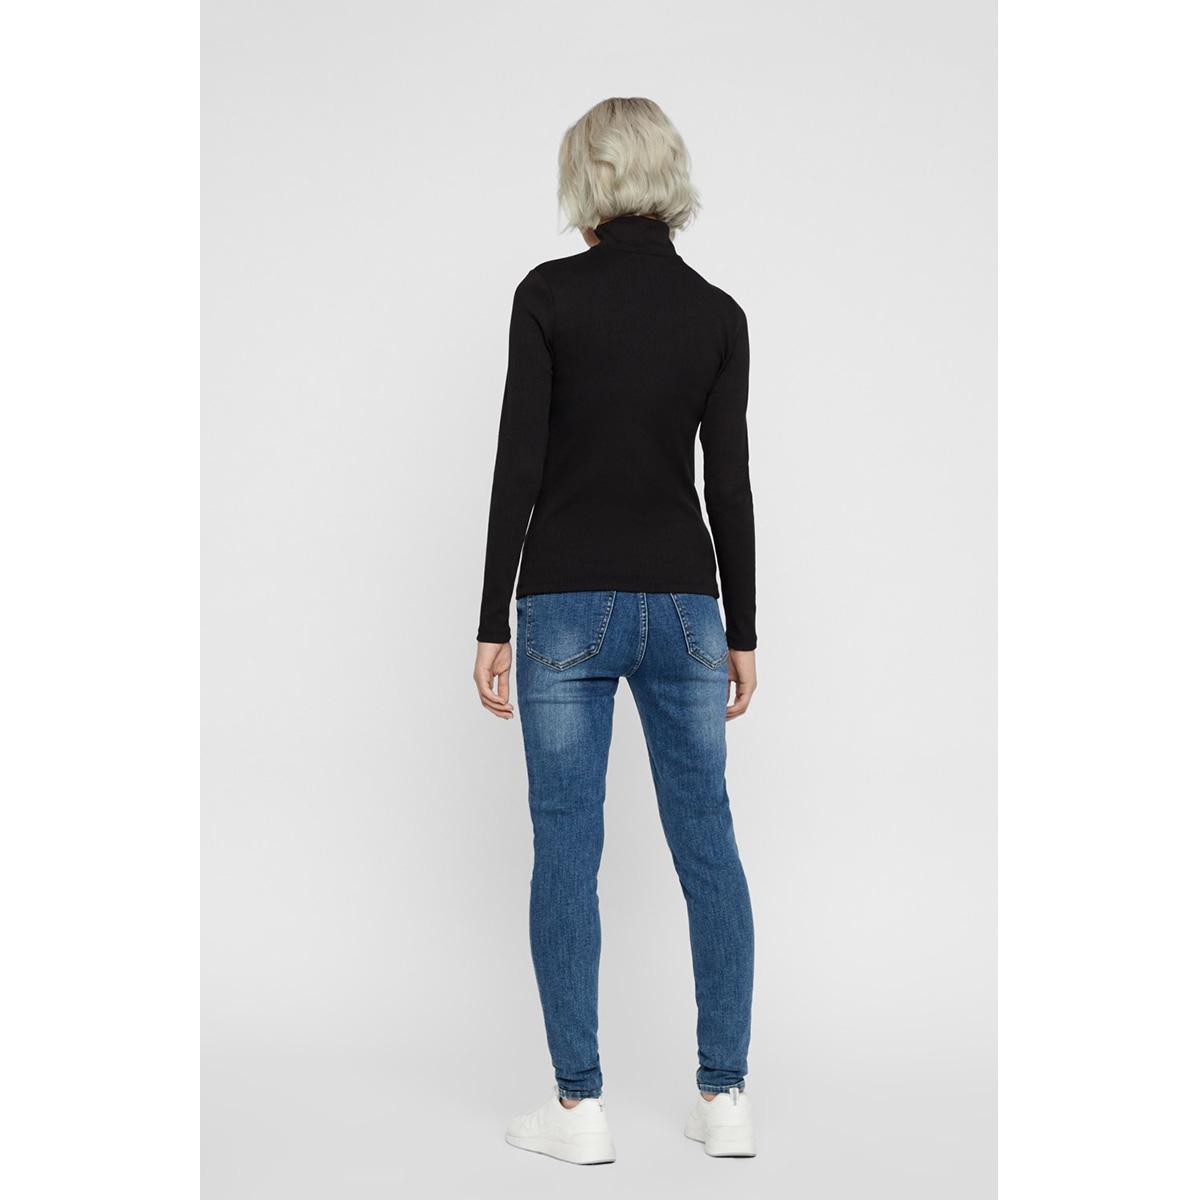 nmrox l/s high neck top 27009809 noisy may t-shirt black